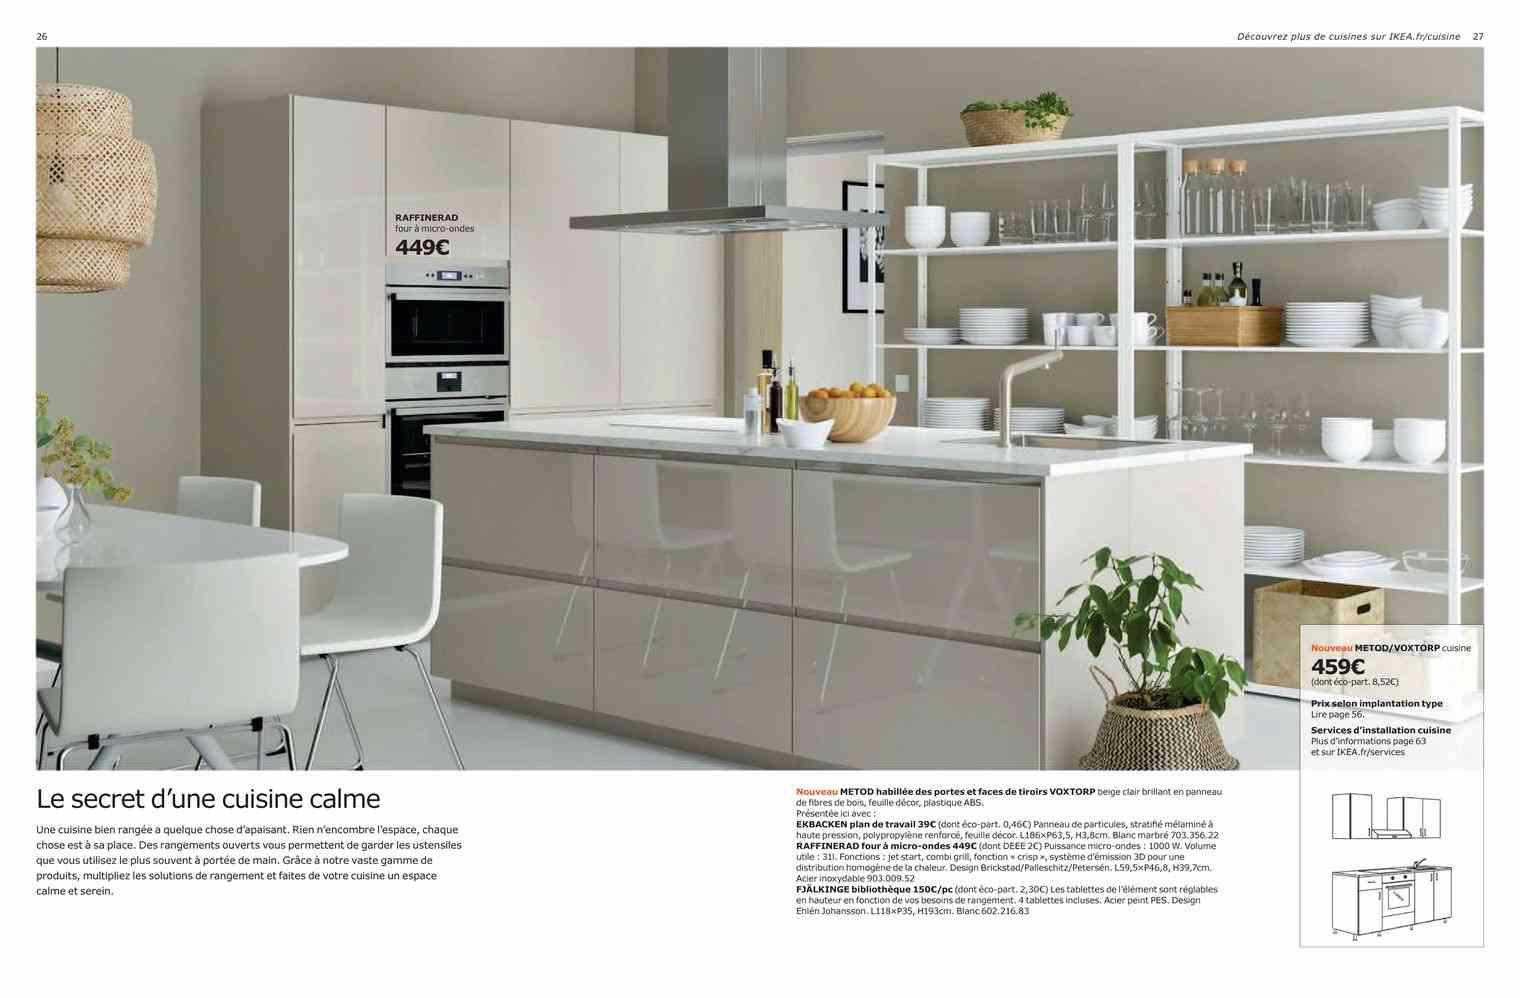 Ikea Cuisine Ringhult Beau Images Promotion Cuisine Ikea Génial Cuisine Ikea Ringhult Blanc Brillant